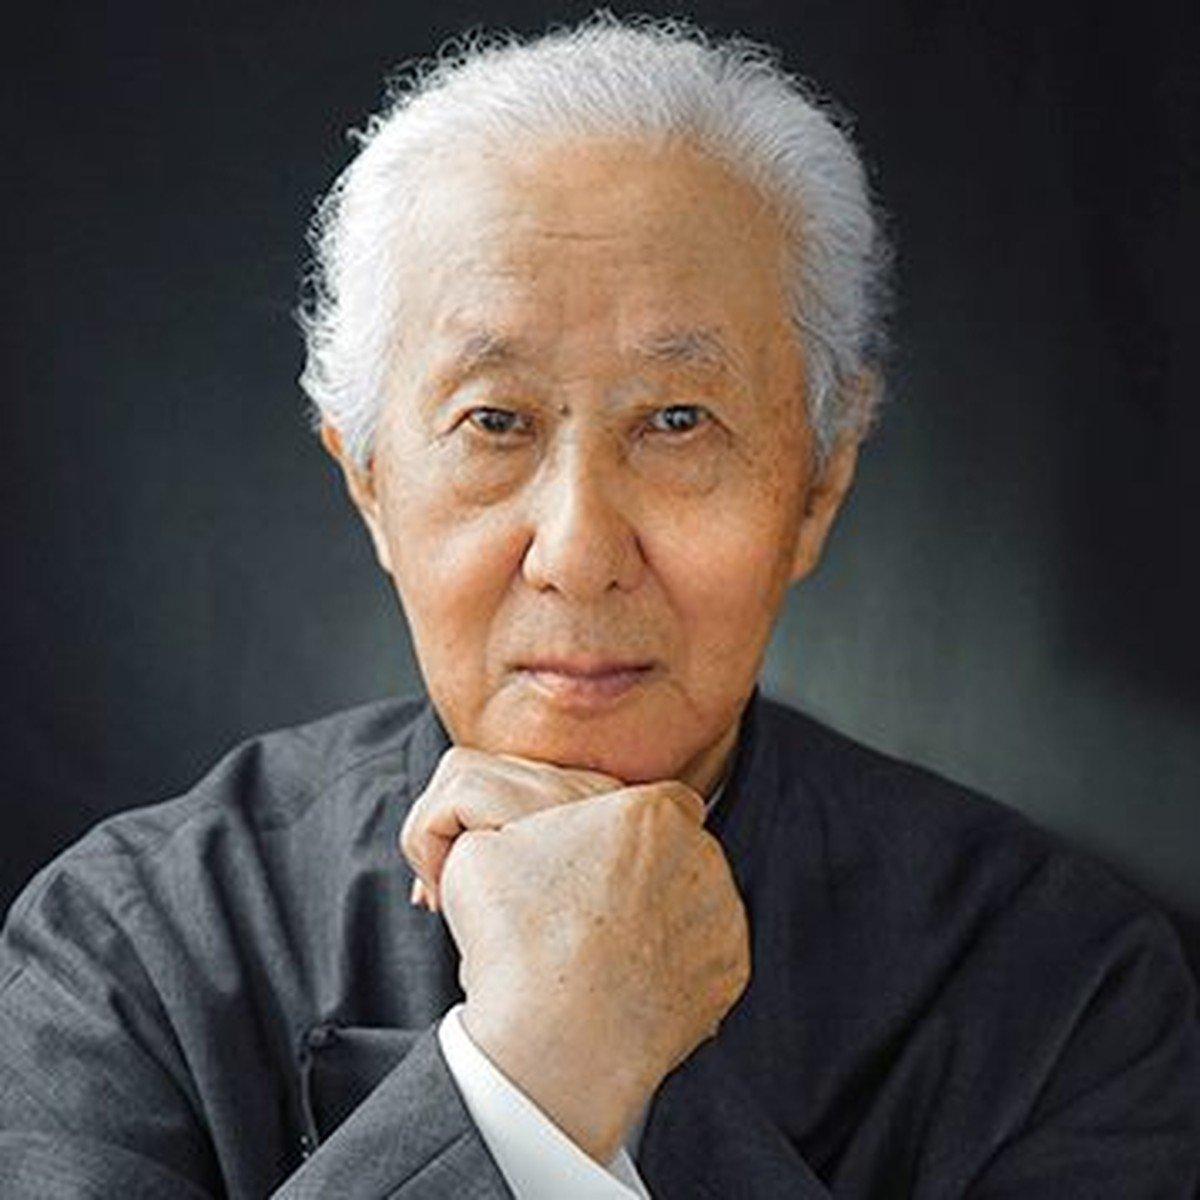 Arata Isozaki, arquiteto japonês, prêmio Pritzker 2019 1